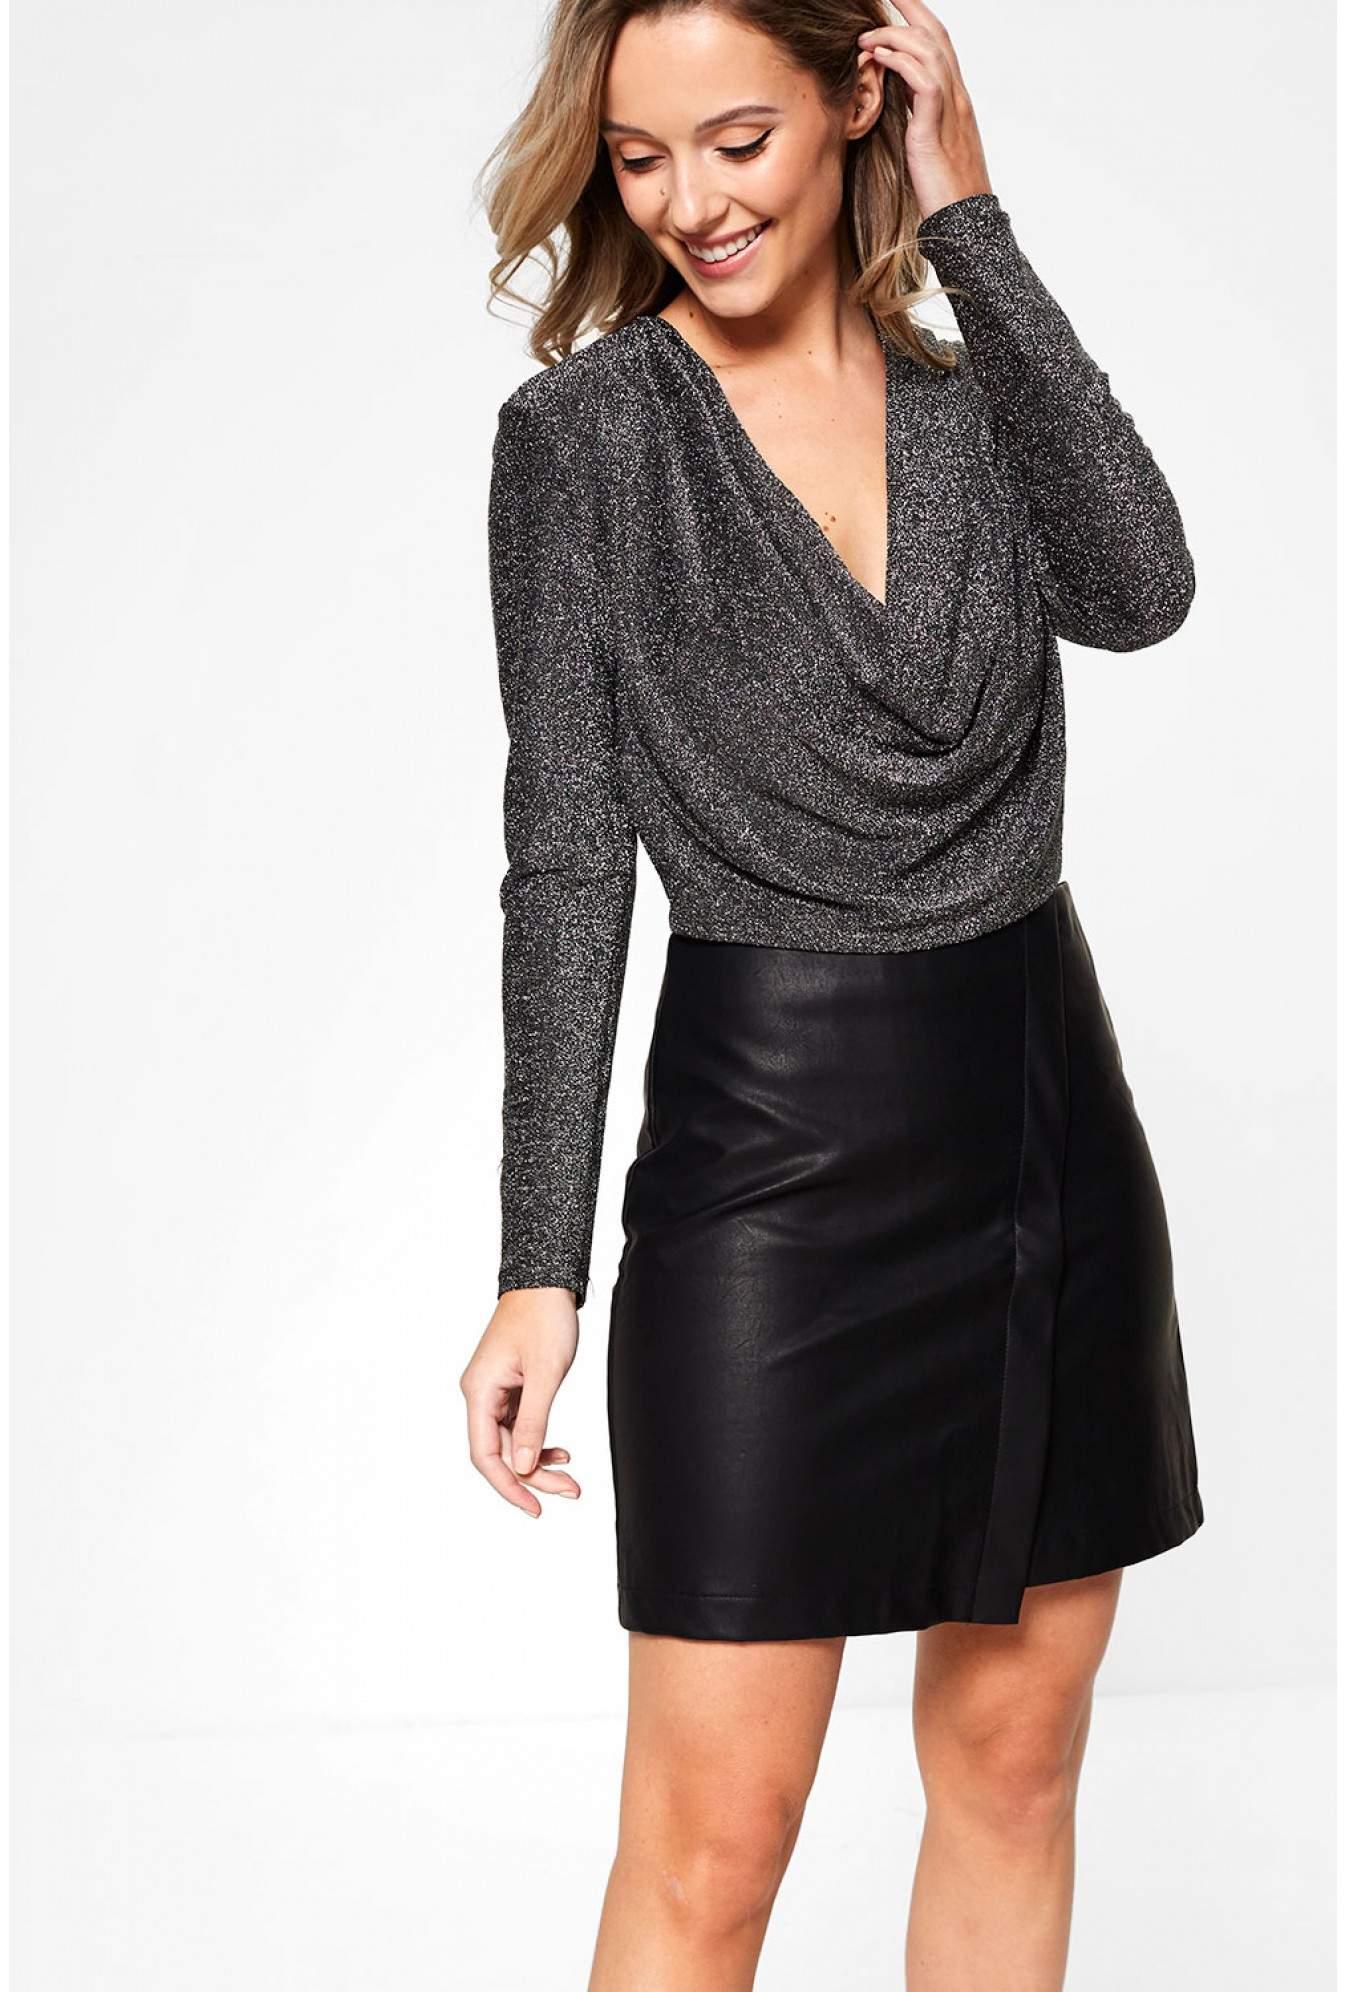 c10972cac0 Girl in Mind Orla Cowl Neck Long Sleeve Bodysuit in Black   iCLOTHING